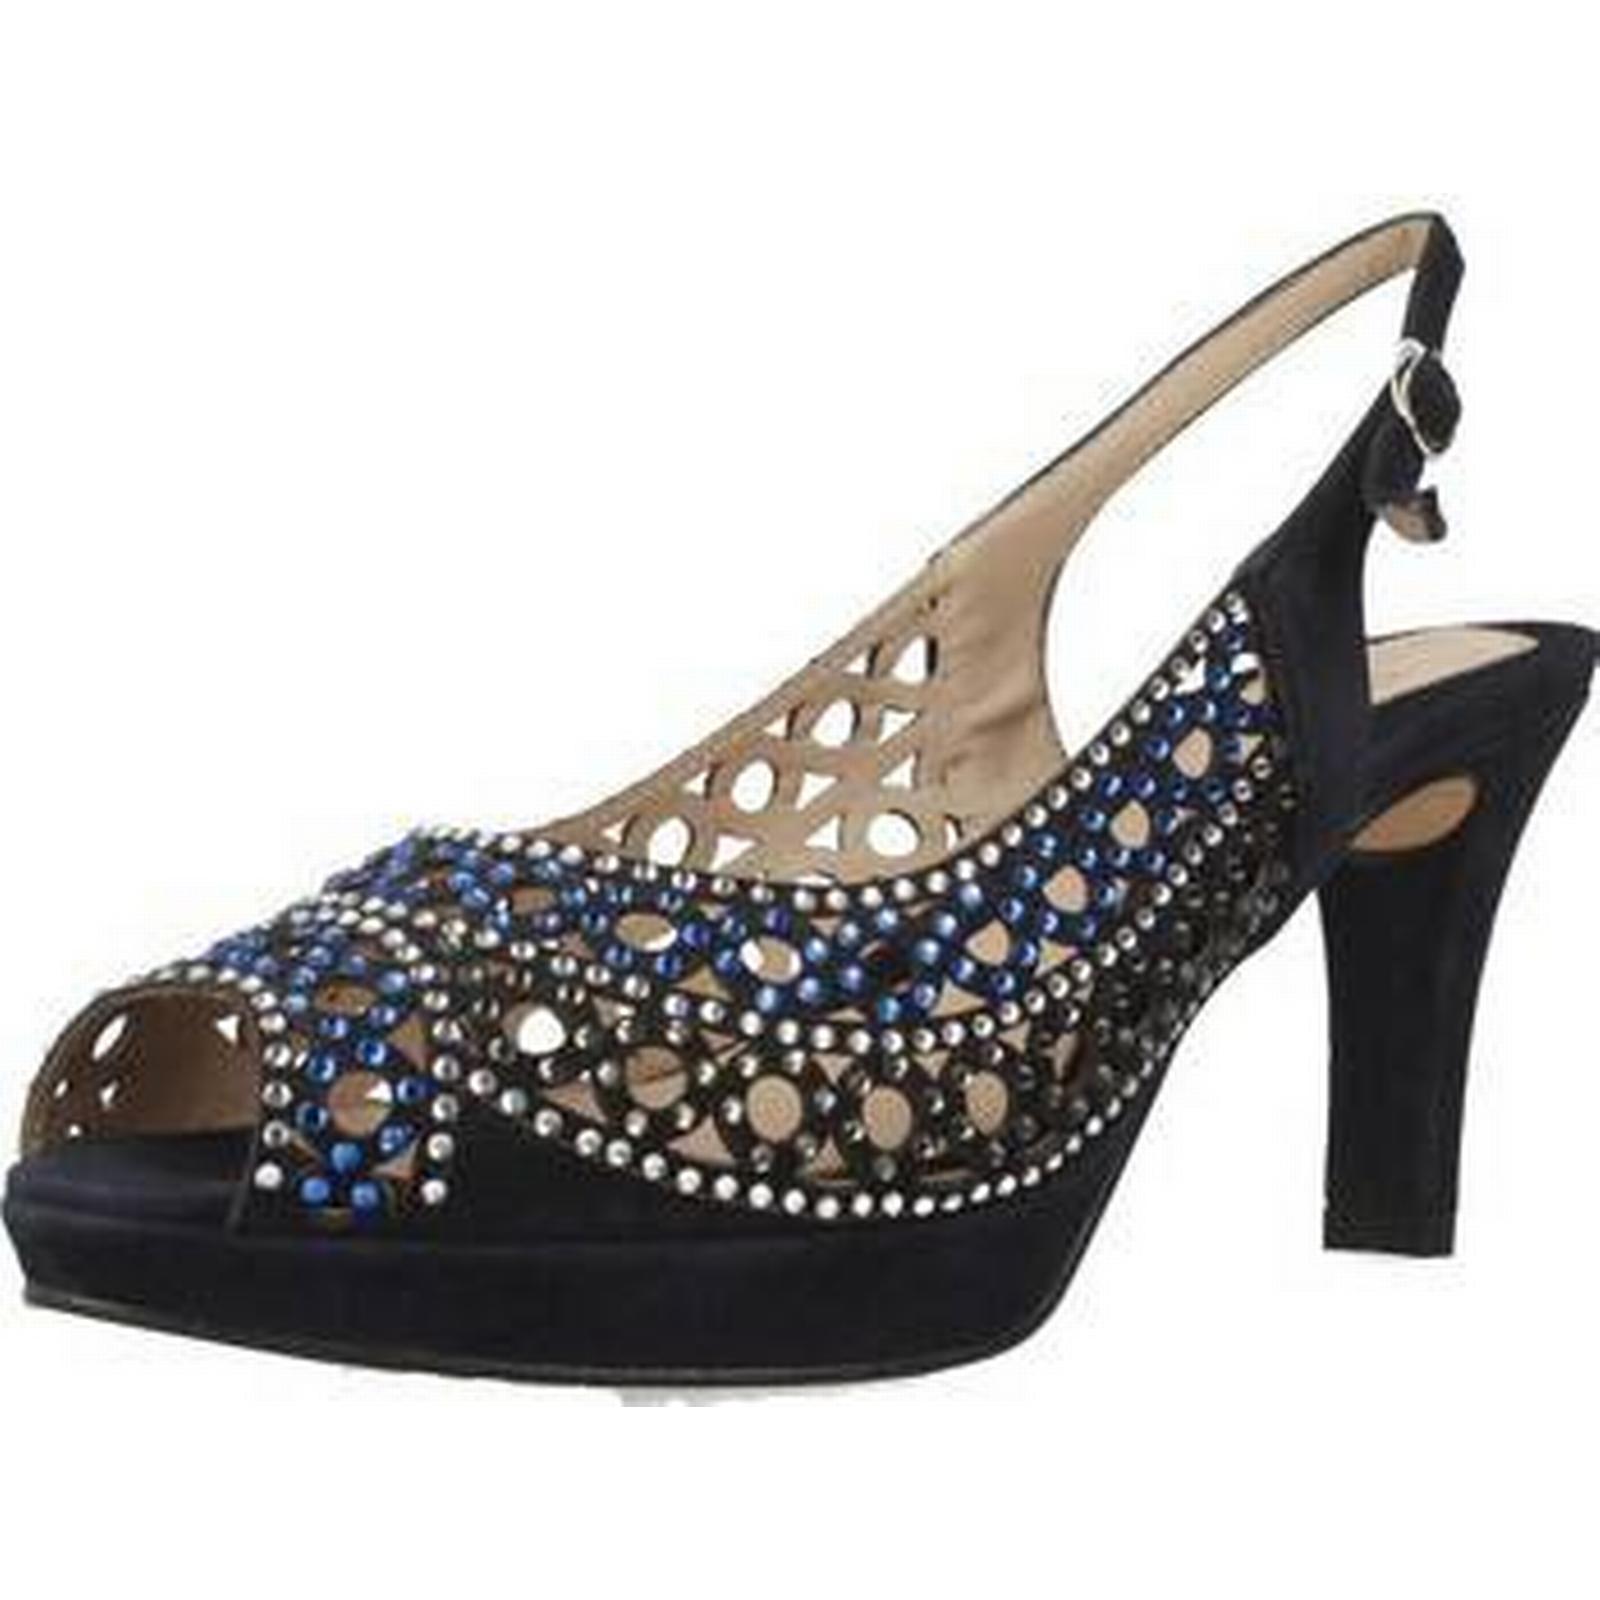 Spartoo.co.uk in Sitgetana 29203 women's Sandals in Spartoo.co.uk Blue b22a90